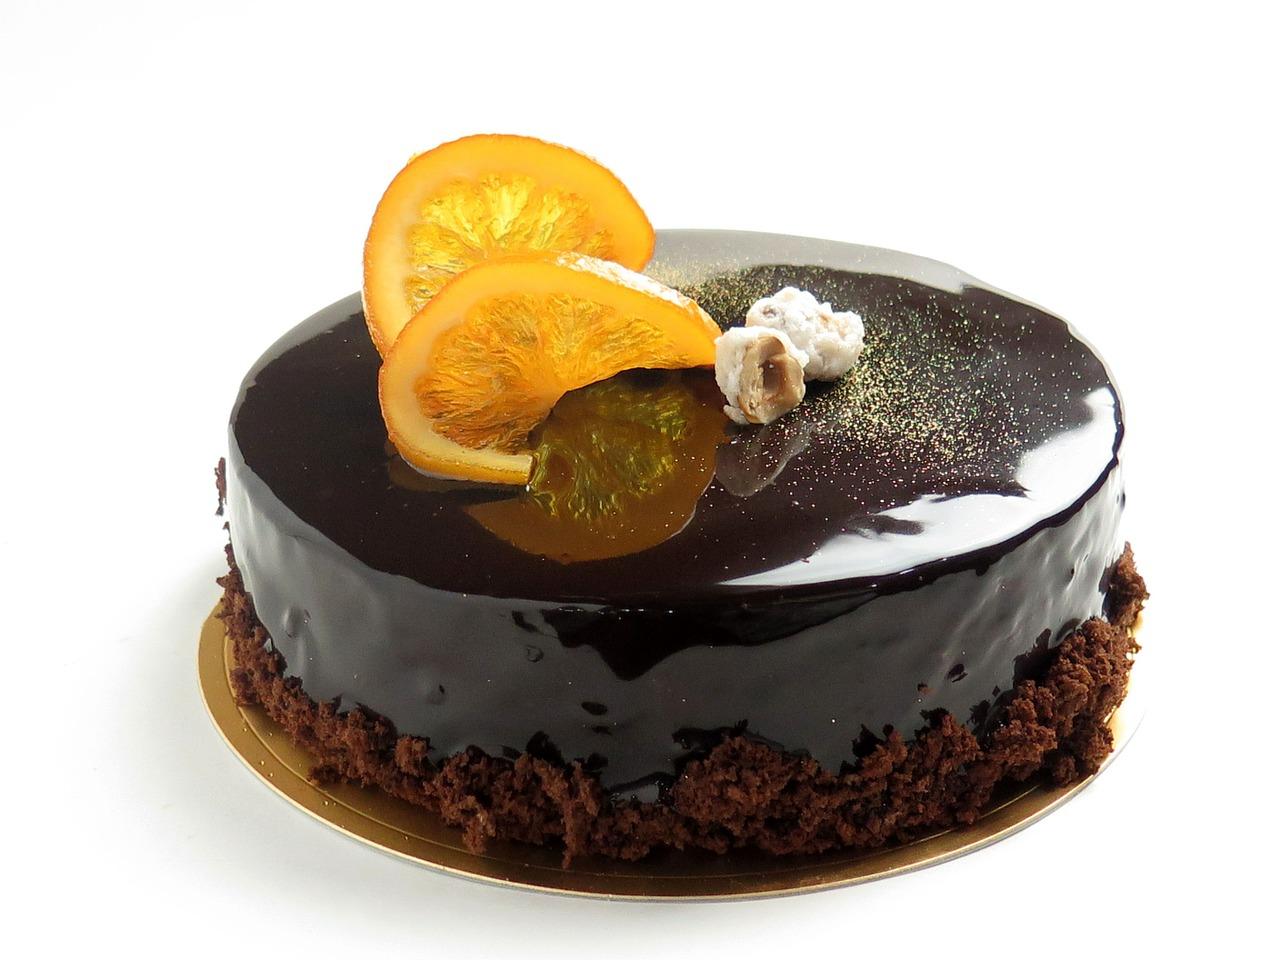 cake-486874_1280.jpg